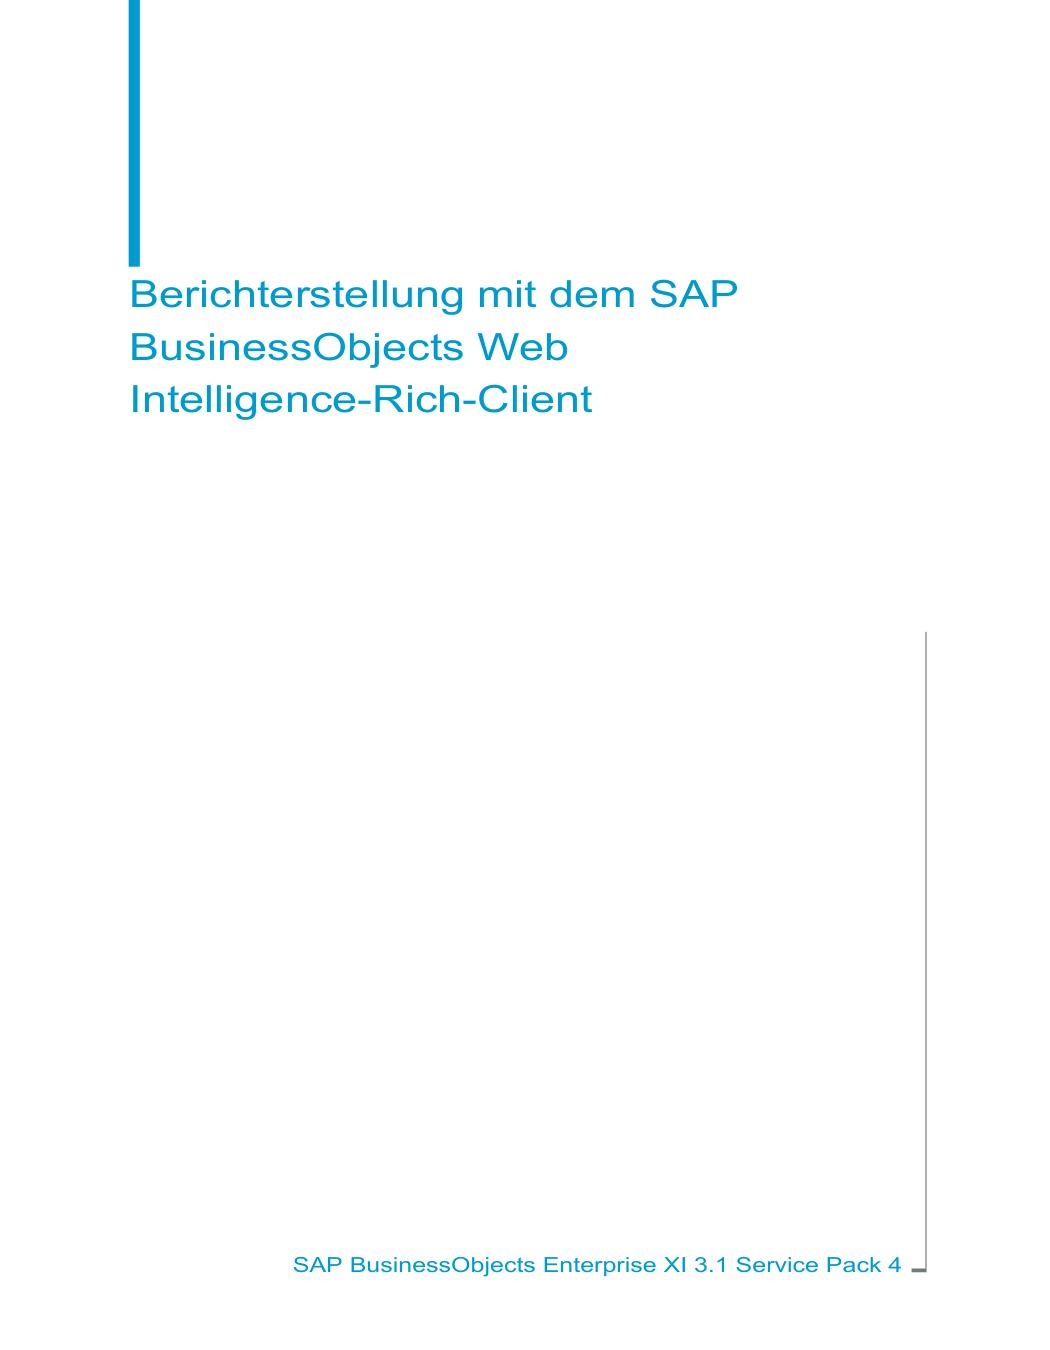 Berichterstellung mit dem SAP BusinessObjects